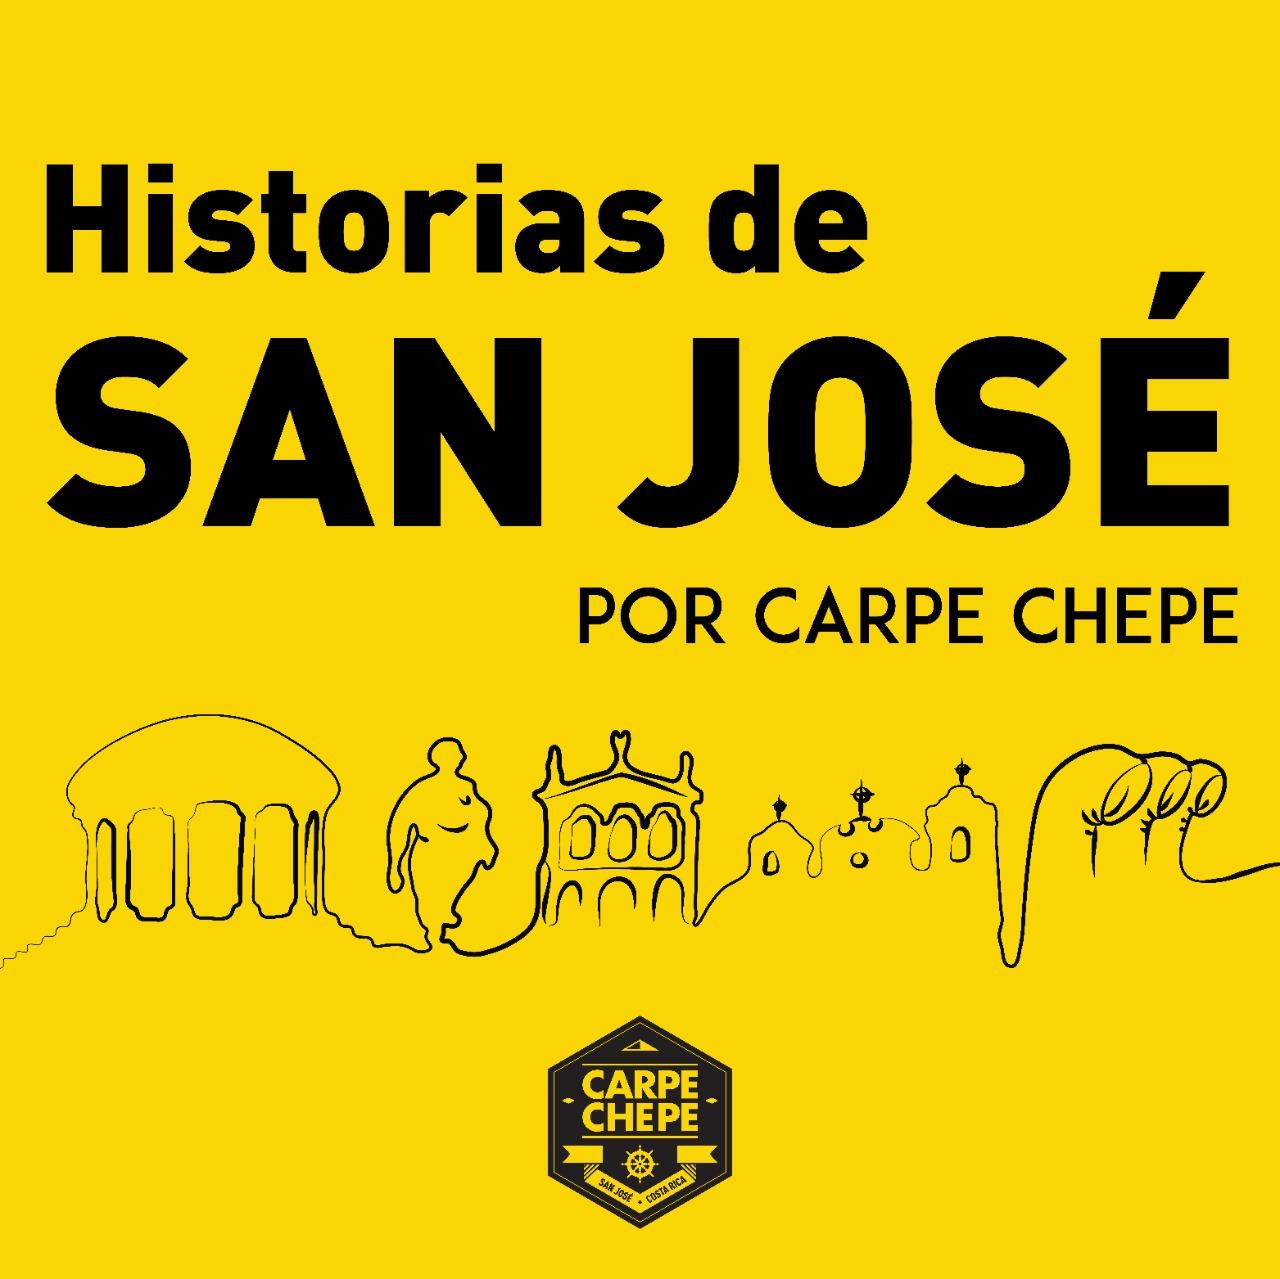 Historias de San Jose - el podcast de Carpe Chepe